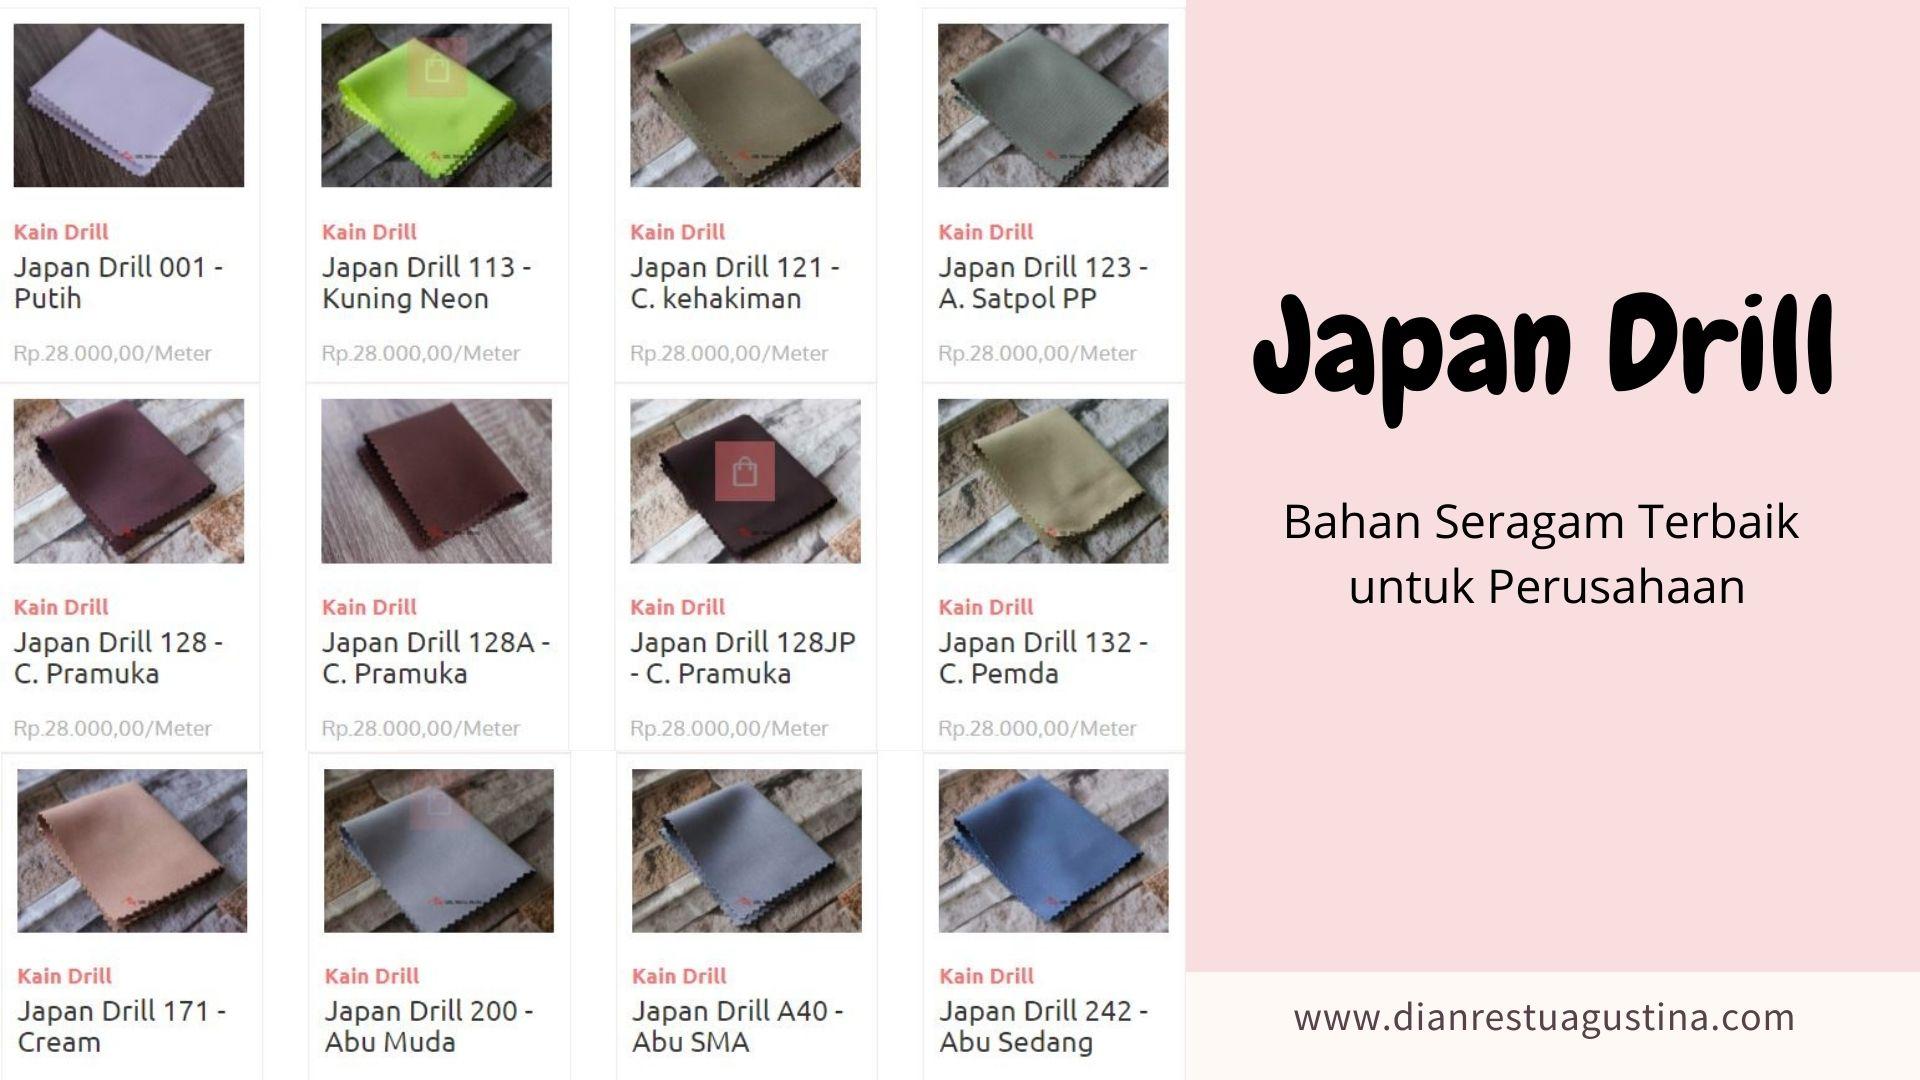 Karakteristik Japan Drill